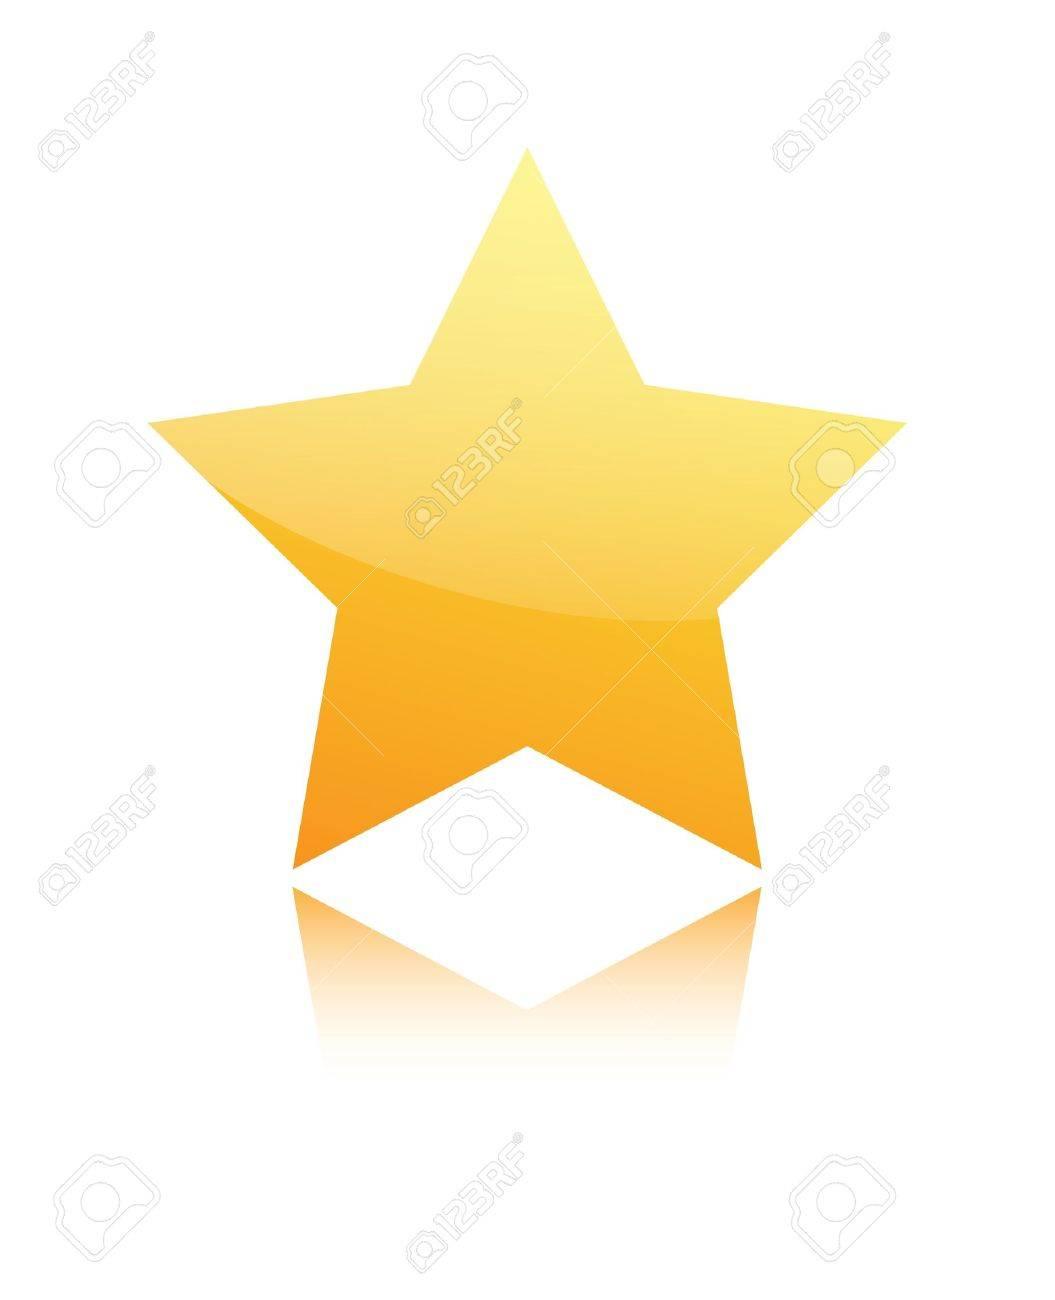 Golden star isolated on white background Stock Vector - 14122122